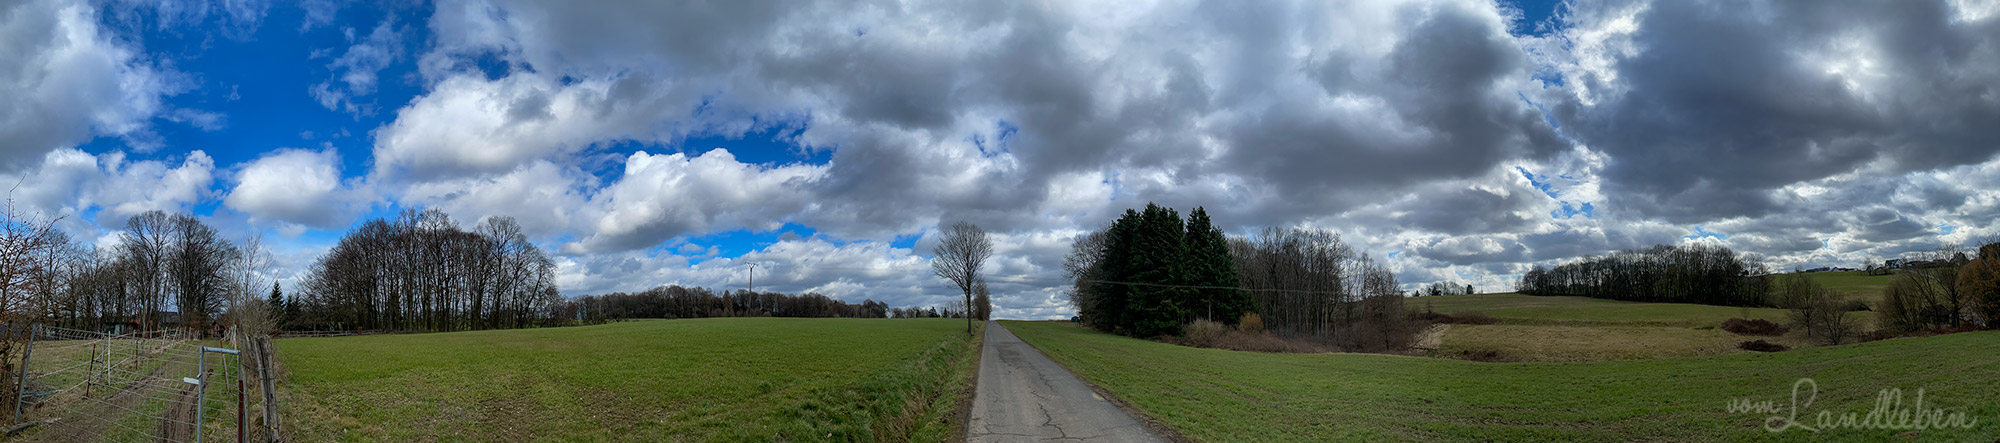 Panorama-Foto vom Himmel